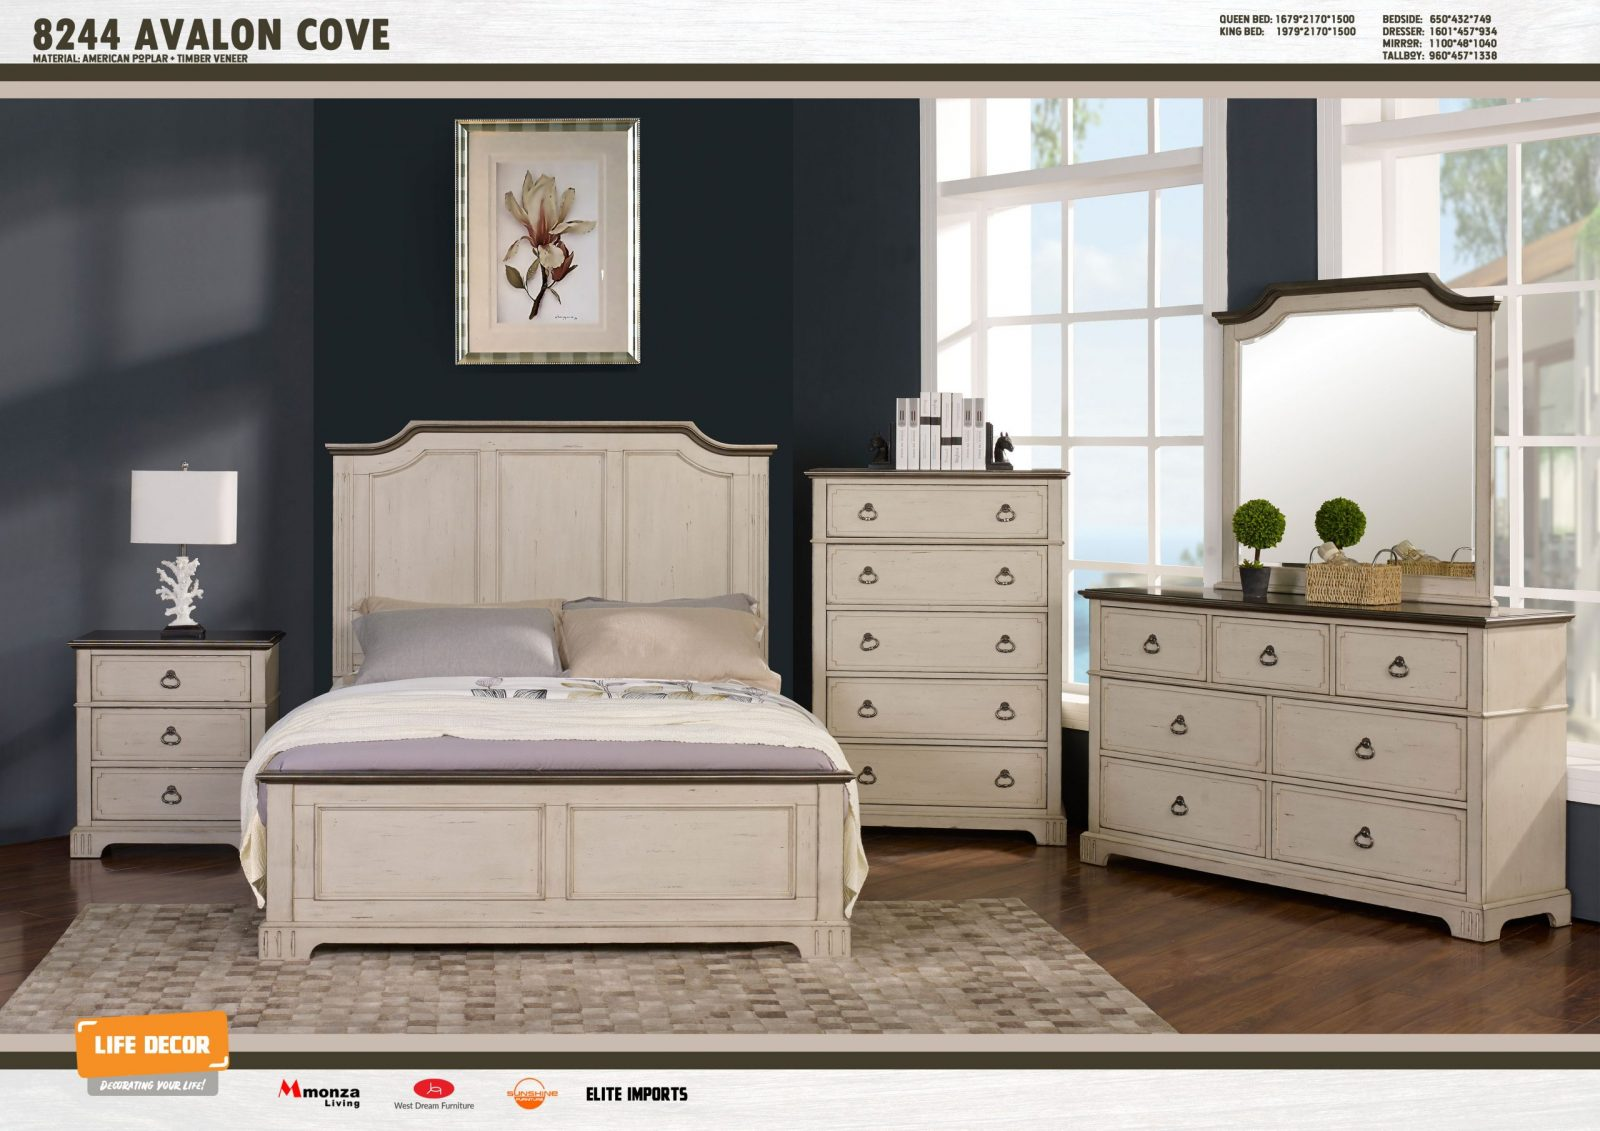 Avalon Cove 4 Piece Bedroom Suite